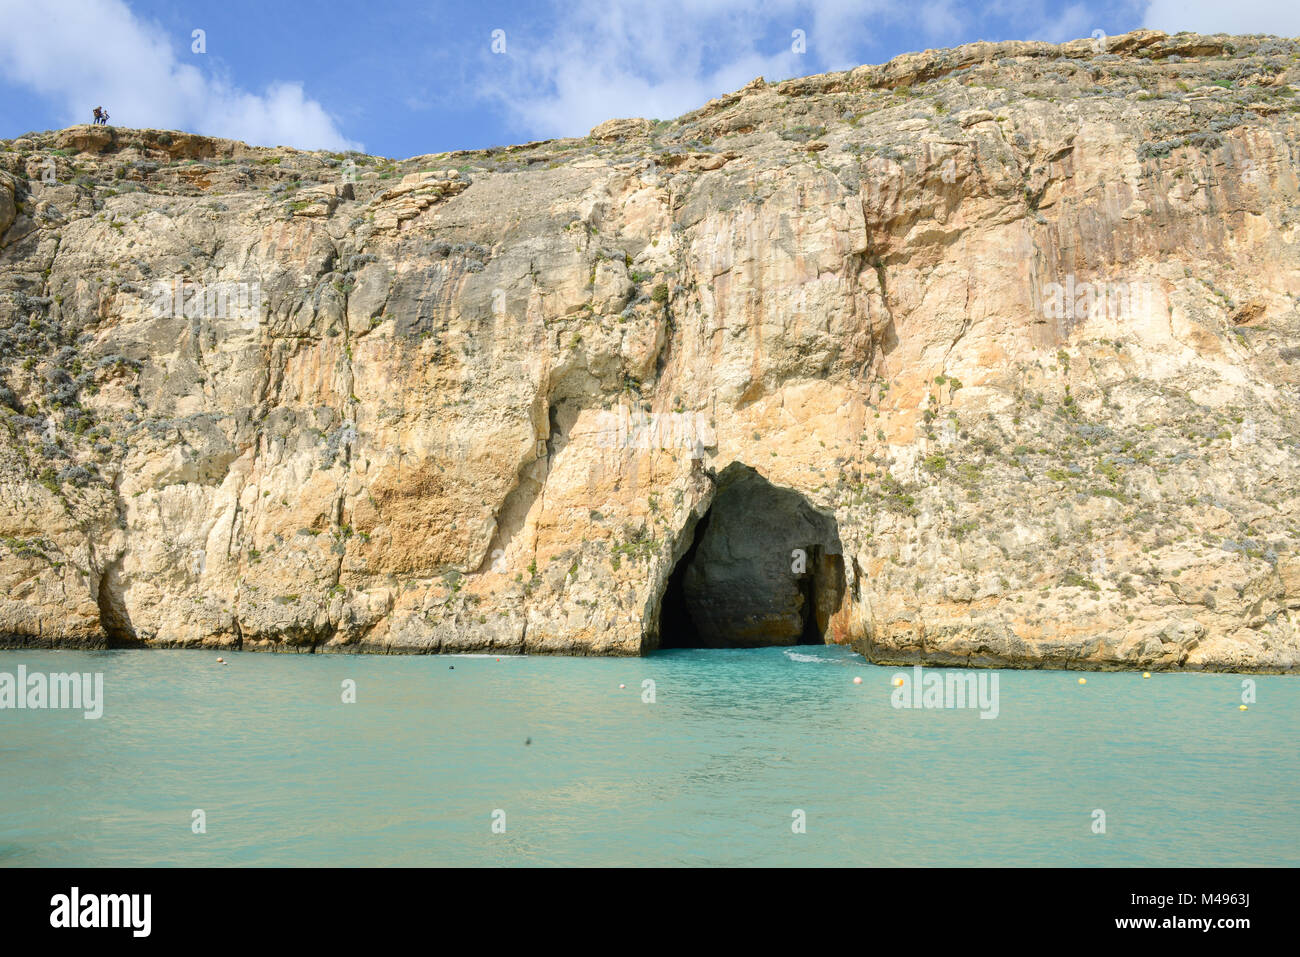 The Iconic Rock Formations at the Azure Window Dwejra Inland Sea on Gozo, Malta Stock Photo